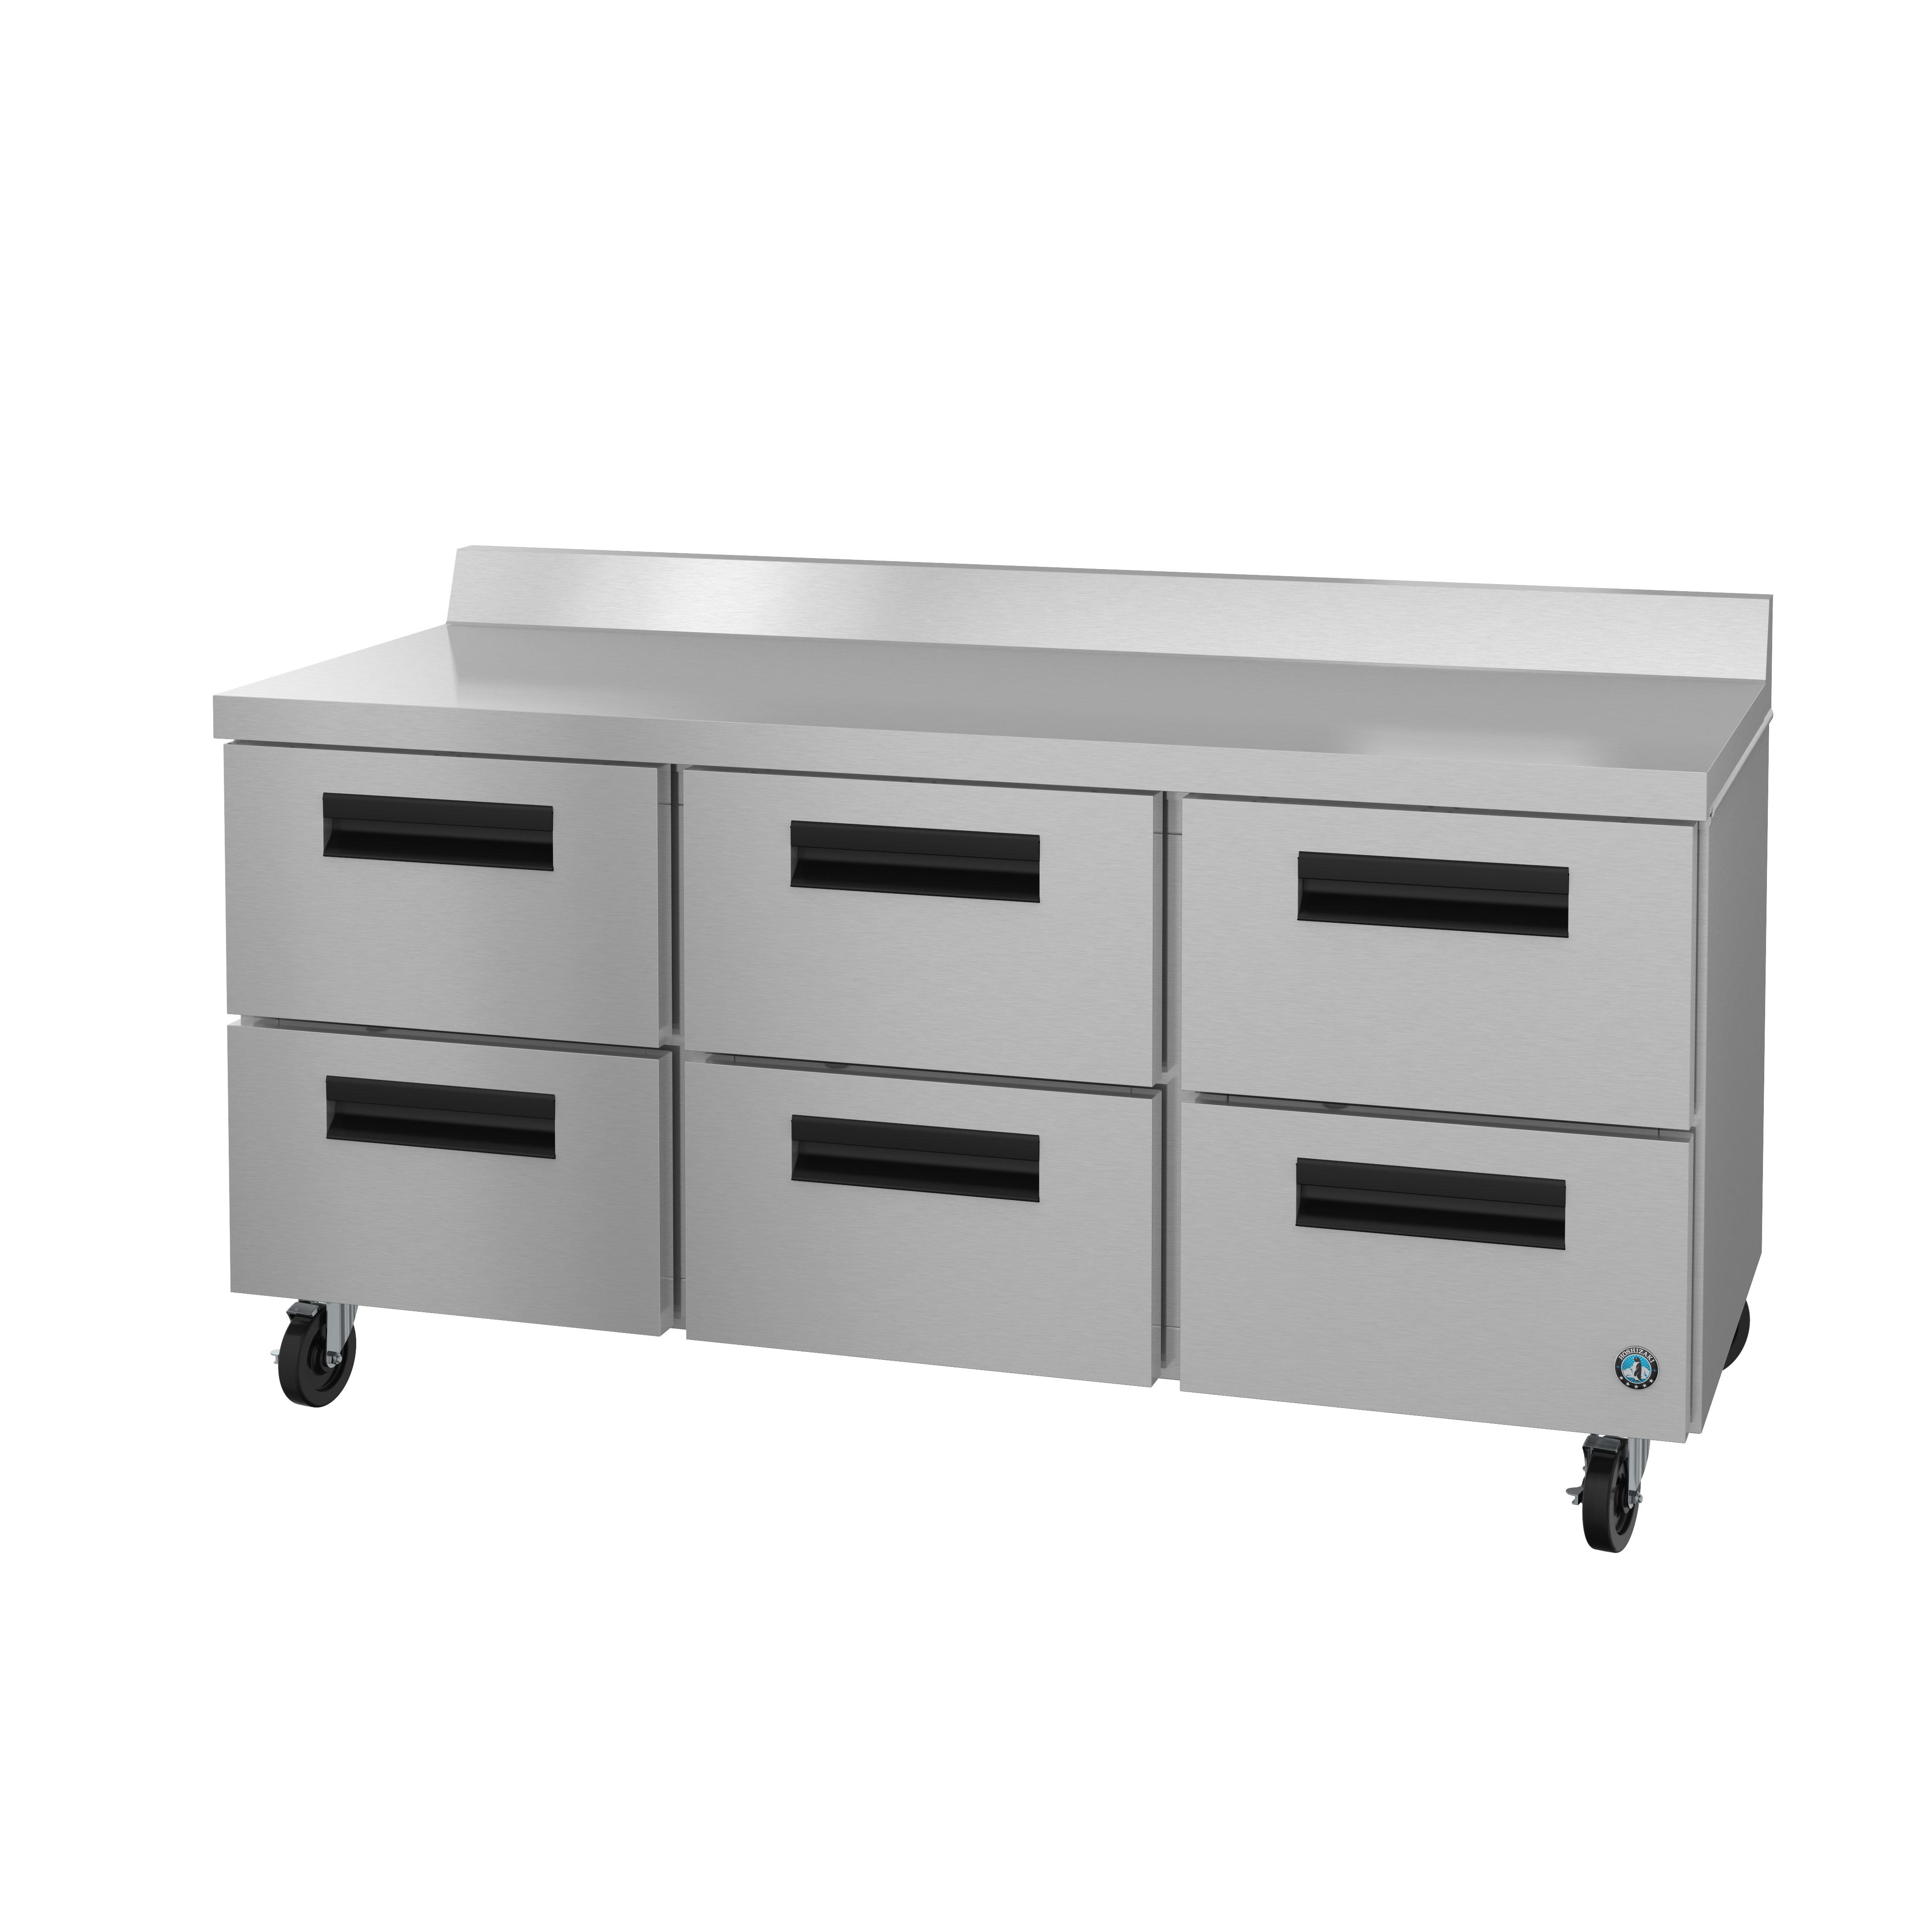 Hoshizaki WR72A-D6 refrigerated counter, work top